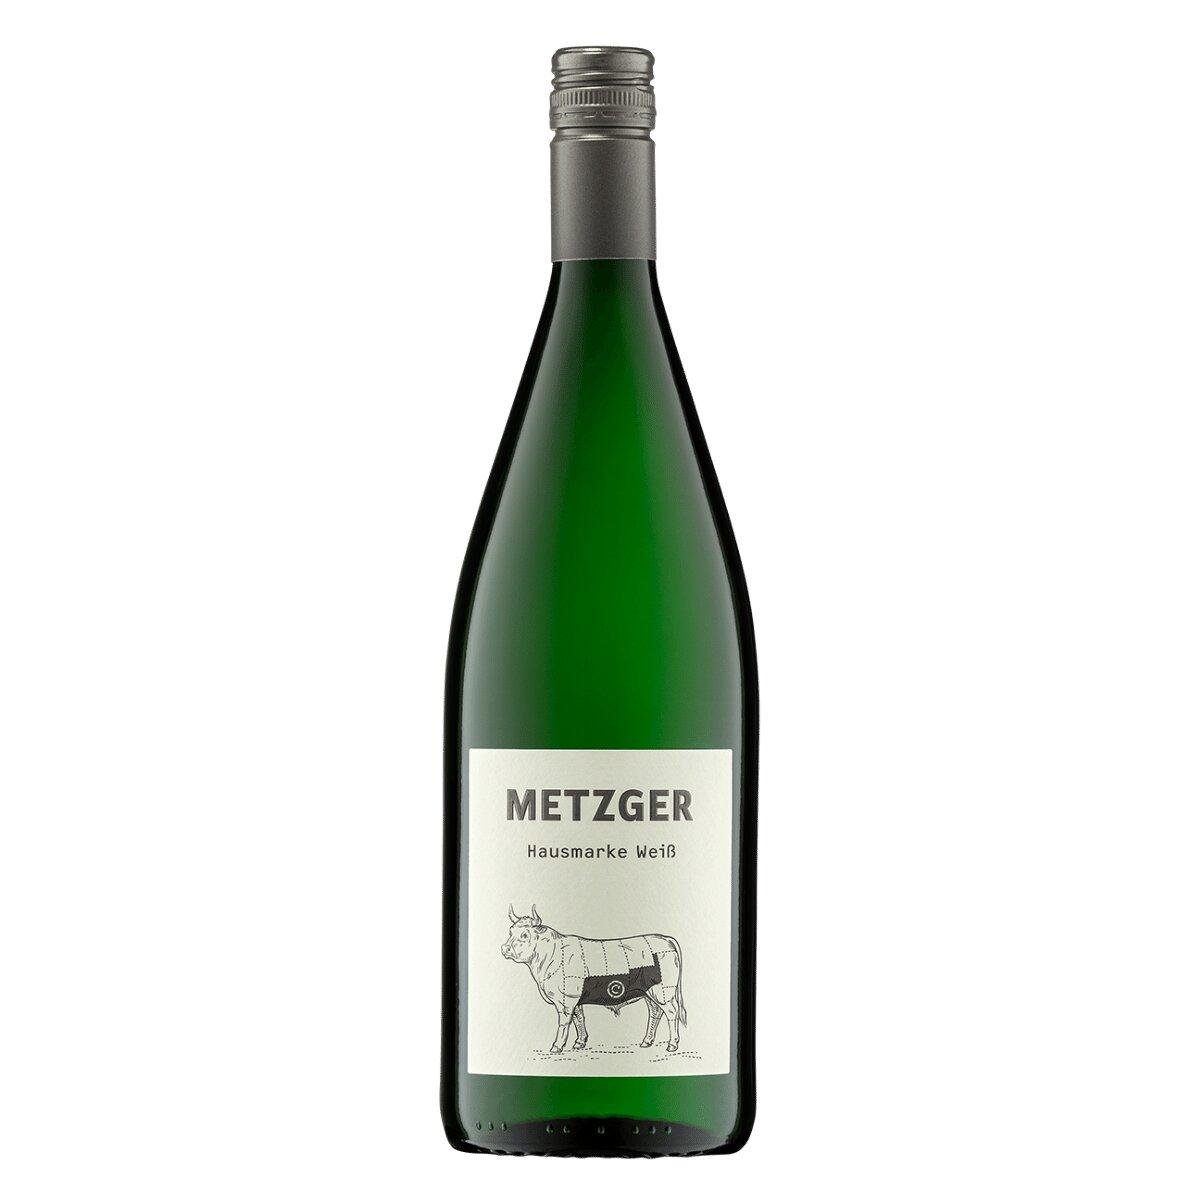 Metzger Hausmarke Weiß 1,0l - Weingut Uli Metzger - , , , ,